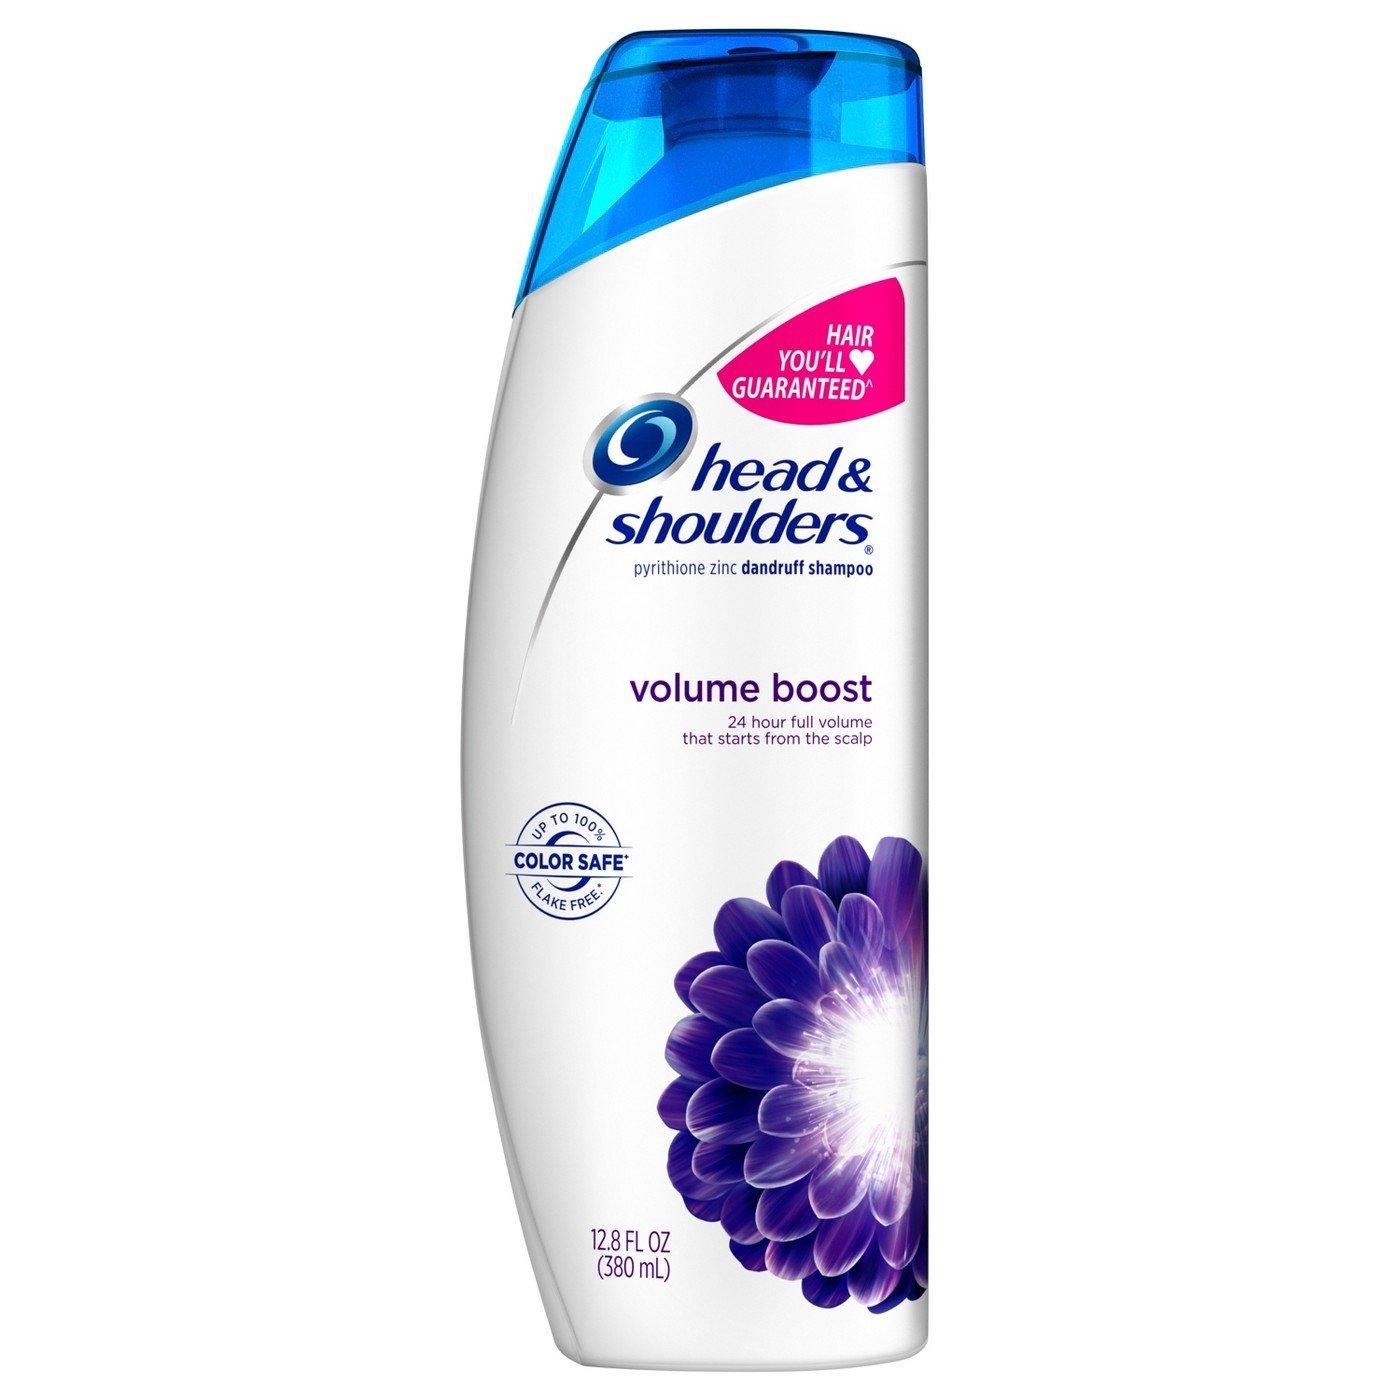 Head & Shoulders Volume Boost Hair Shampoo